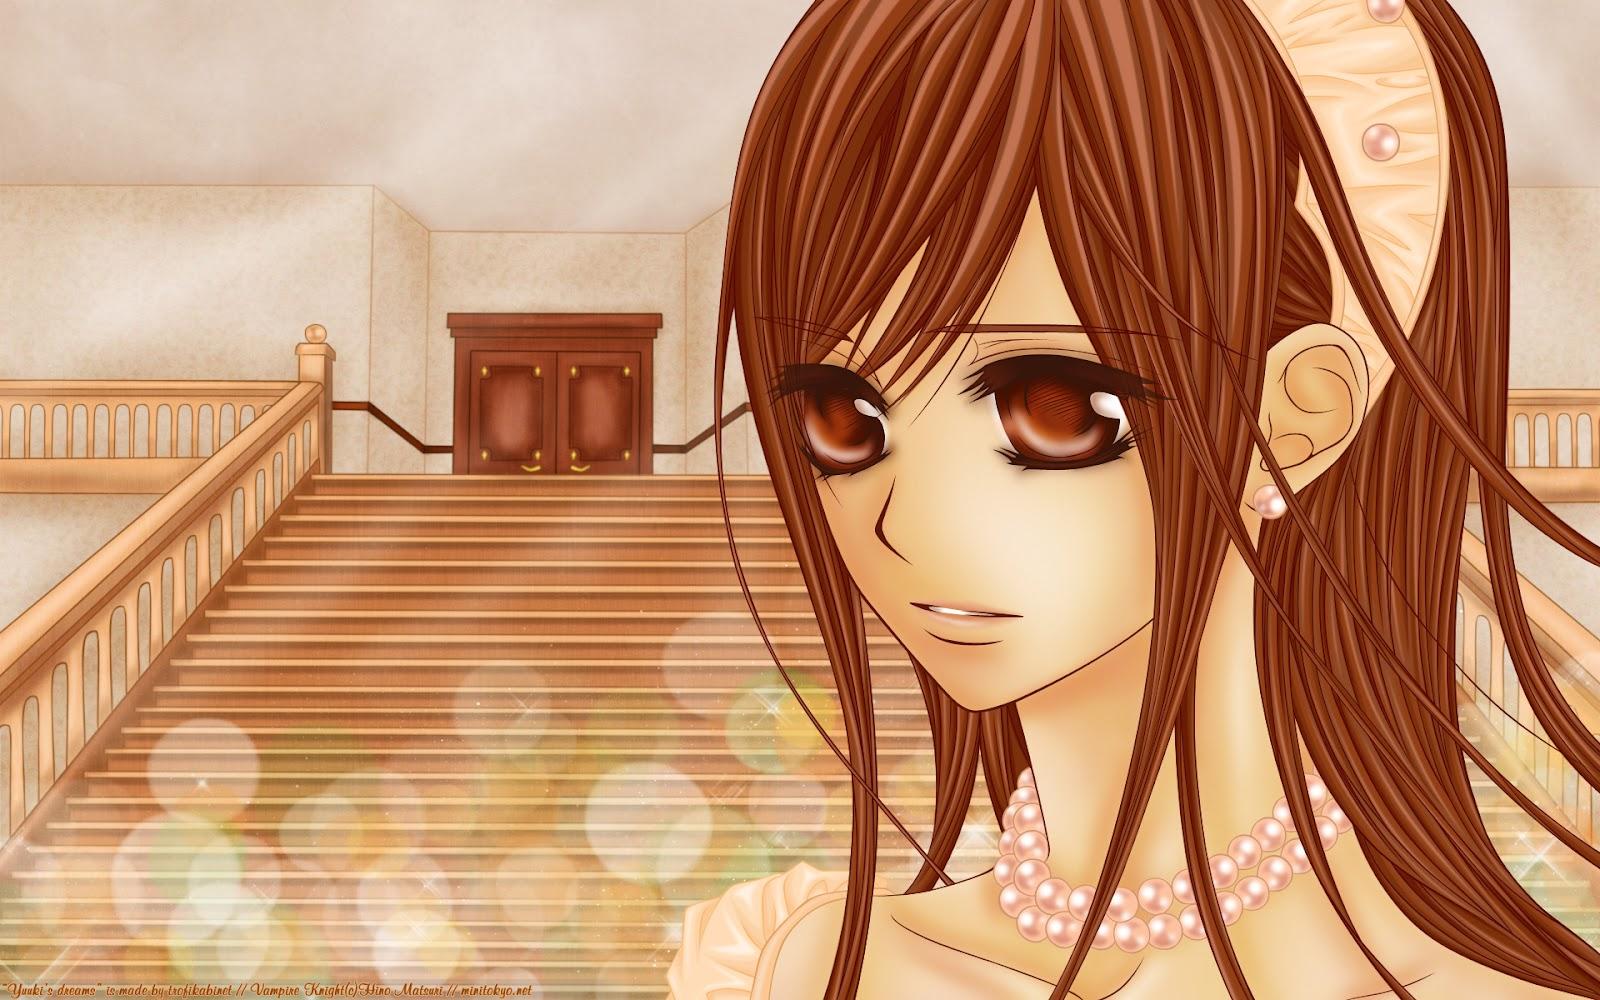 http://2.bp.blogspot.com/-Uqj4hppq7VA/UABGzHMSiSI/AAAAAAAAAQc/SdtzEupOees/s1600/Yuuki-s-dreams-yuuki-cross-kuran-8365007-1920-1200.jpg